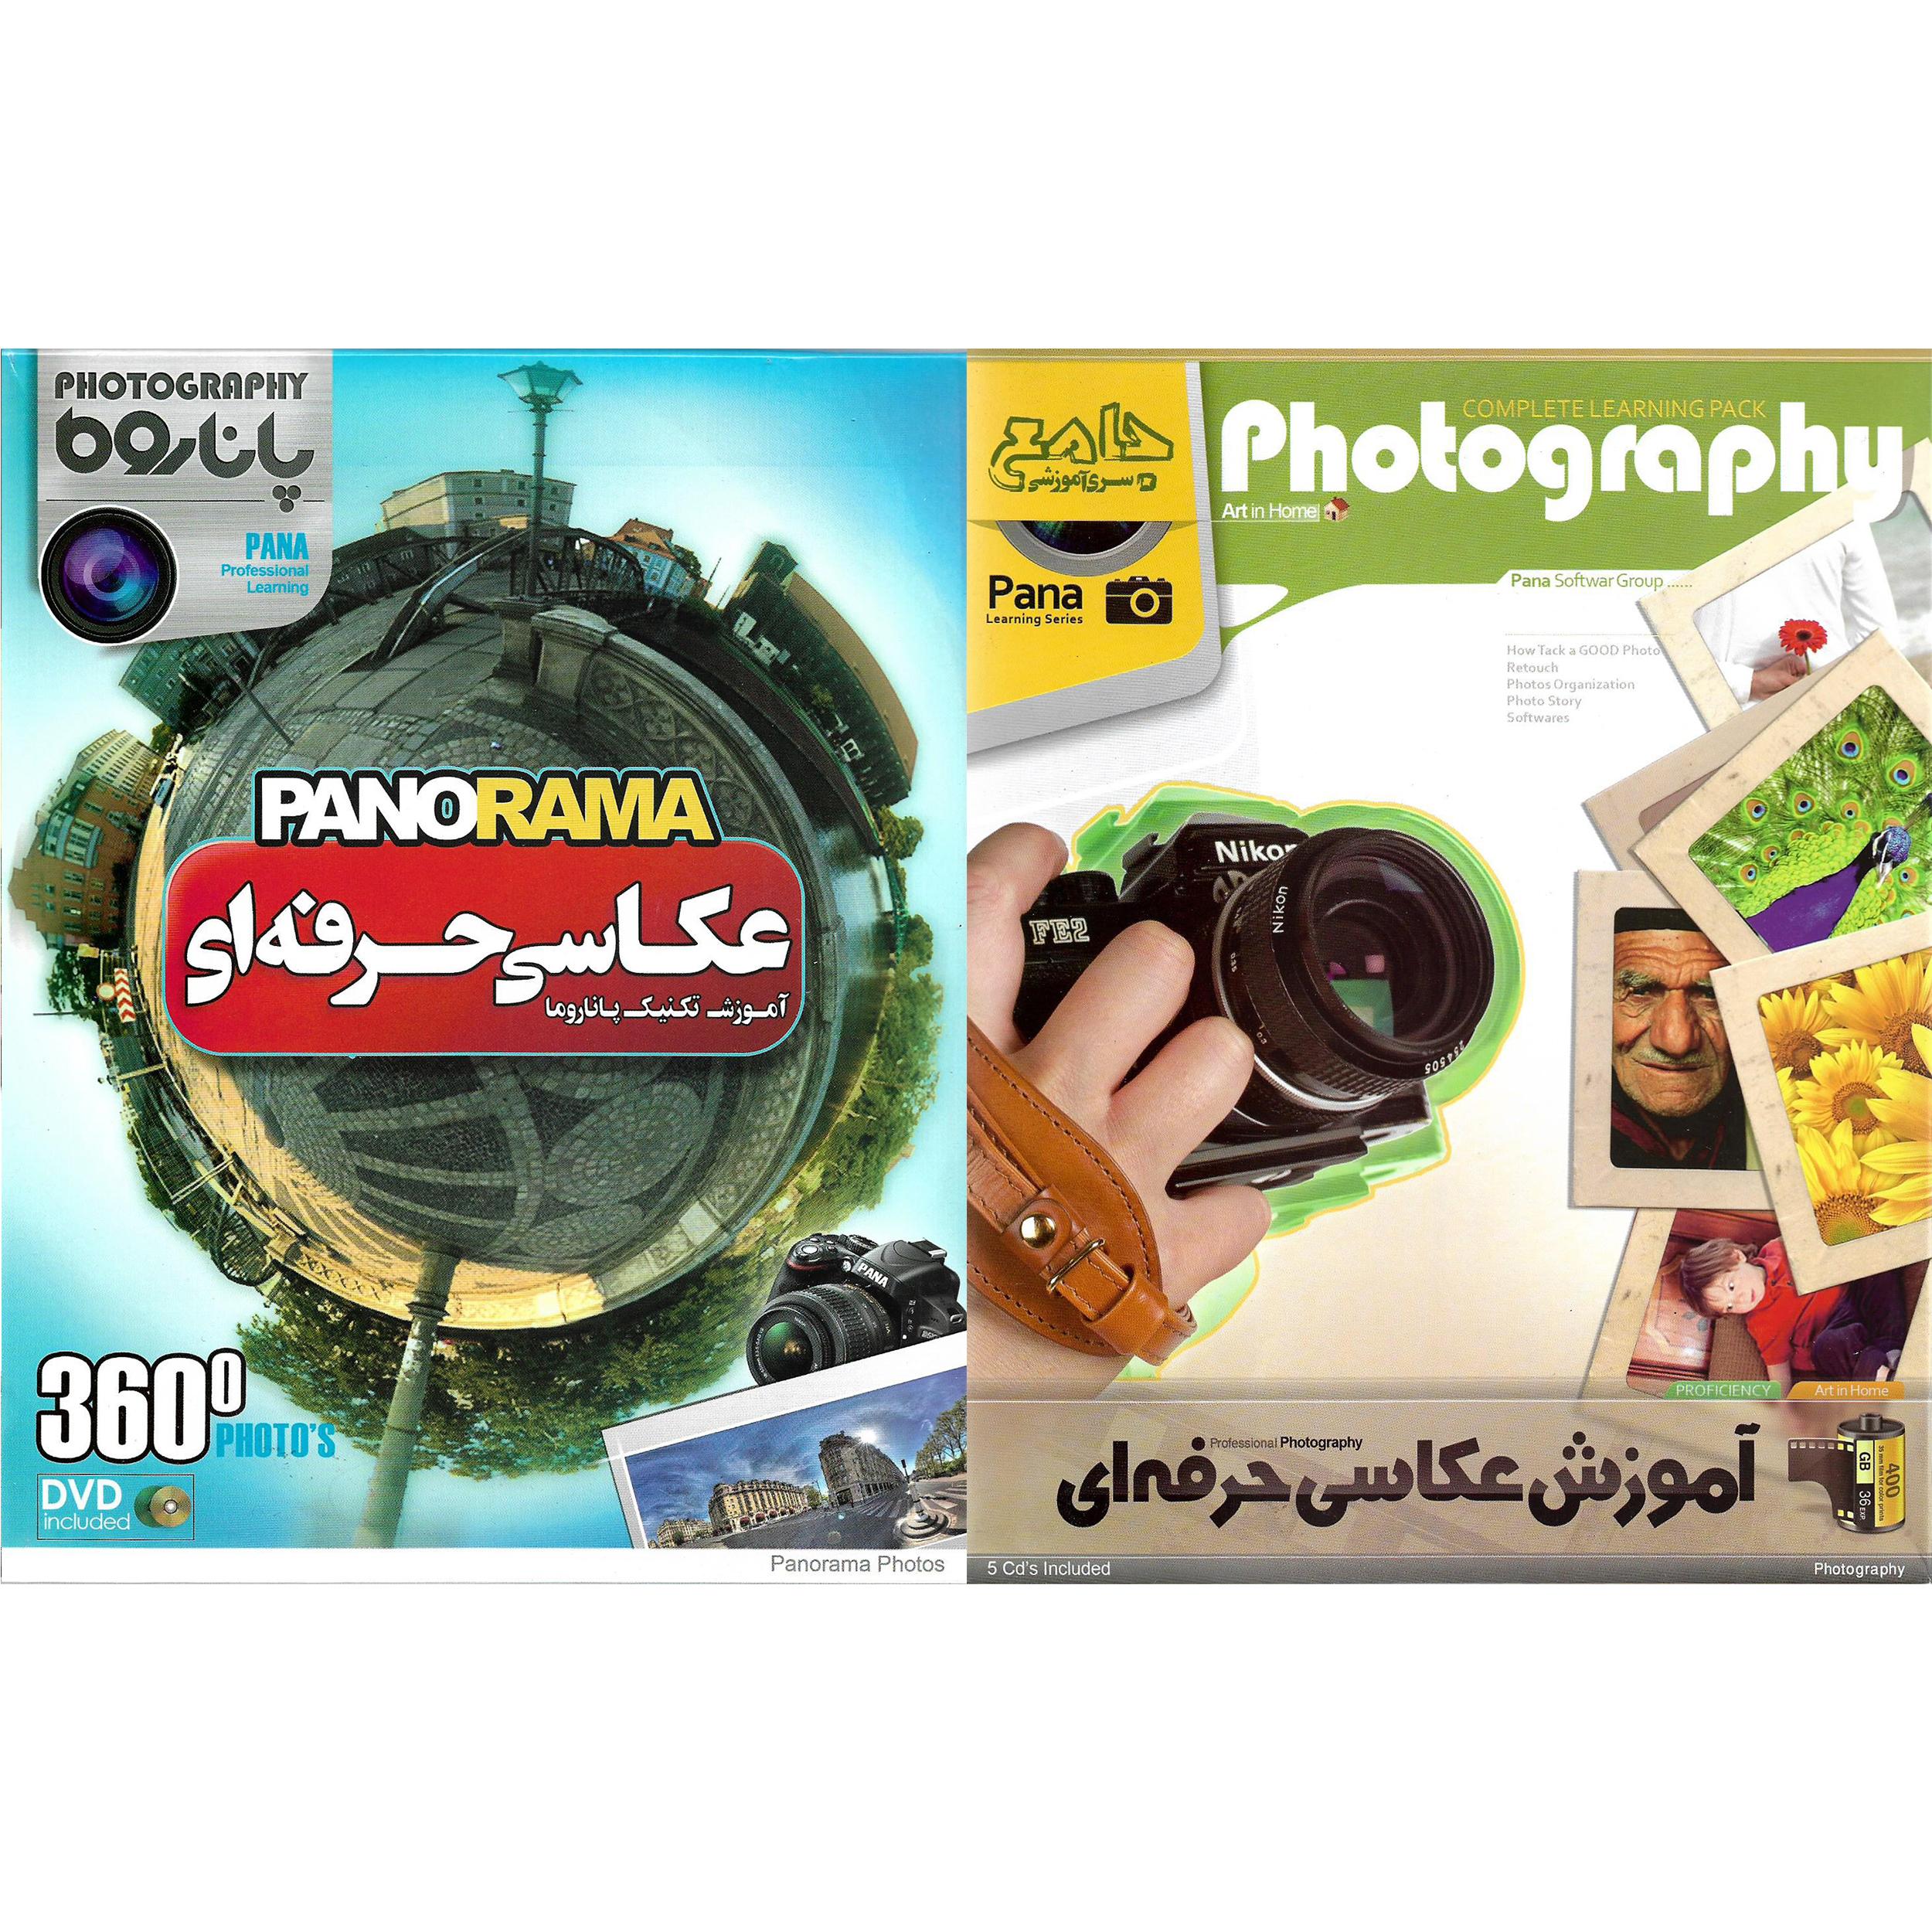 نرم افزار آموزش عکاسی حرفه ای نشر پانا به همراه نرم افزار آموزش عکاسی حرفه ای PANORAMA نشر پانا